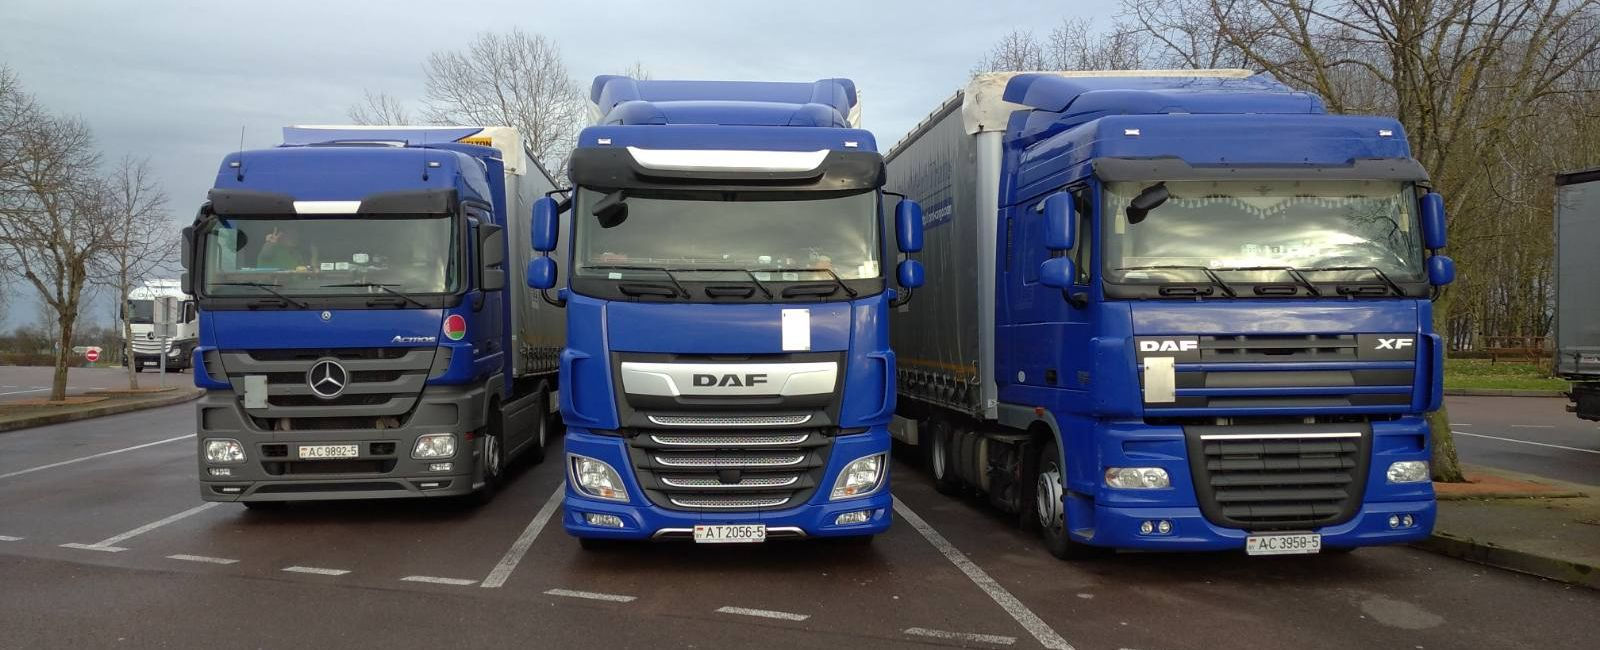 pmt-cargo - грузовые перевозки